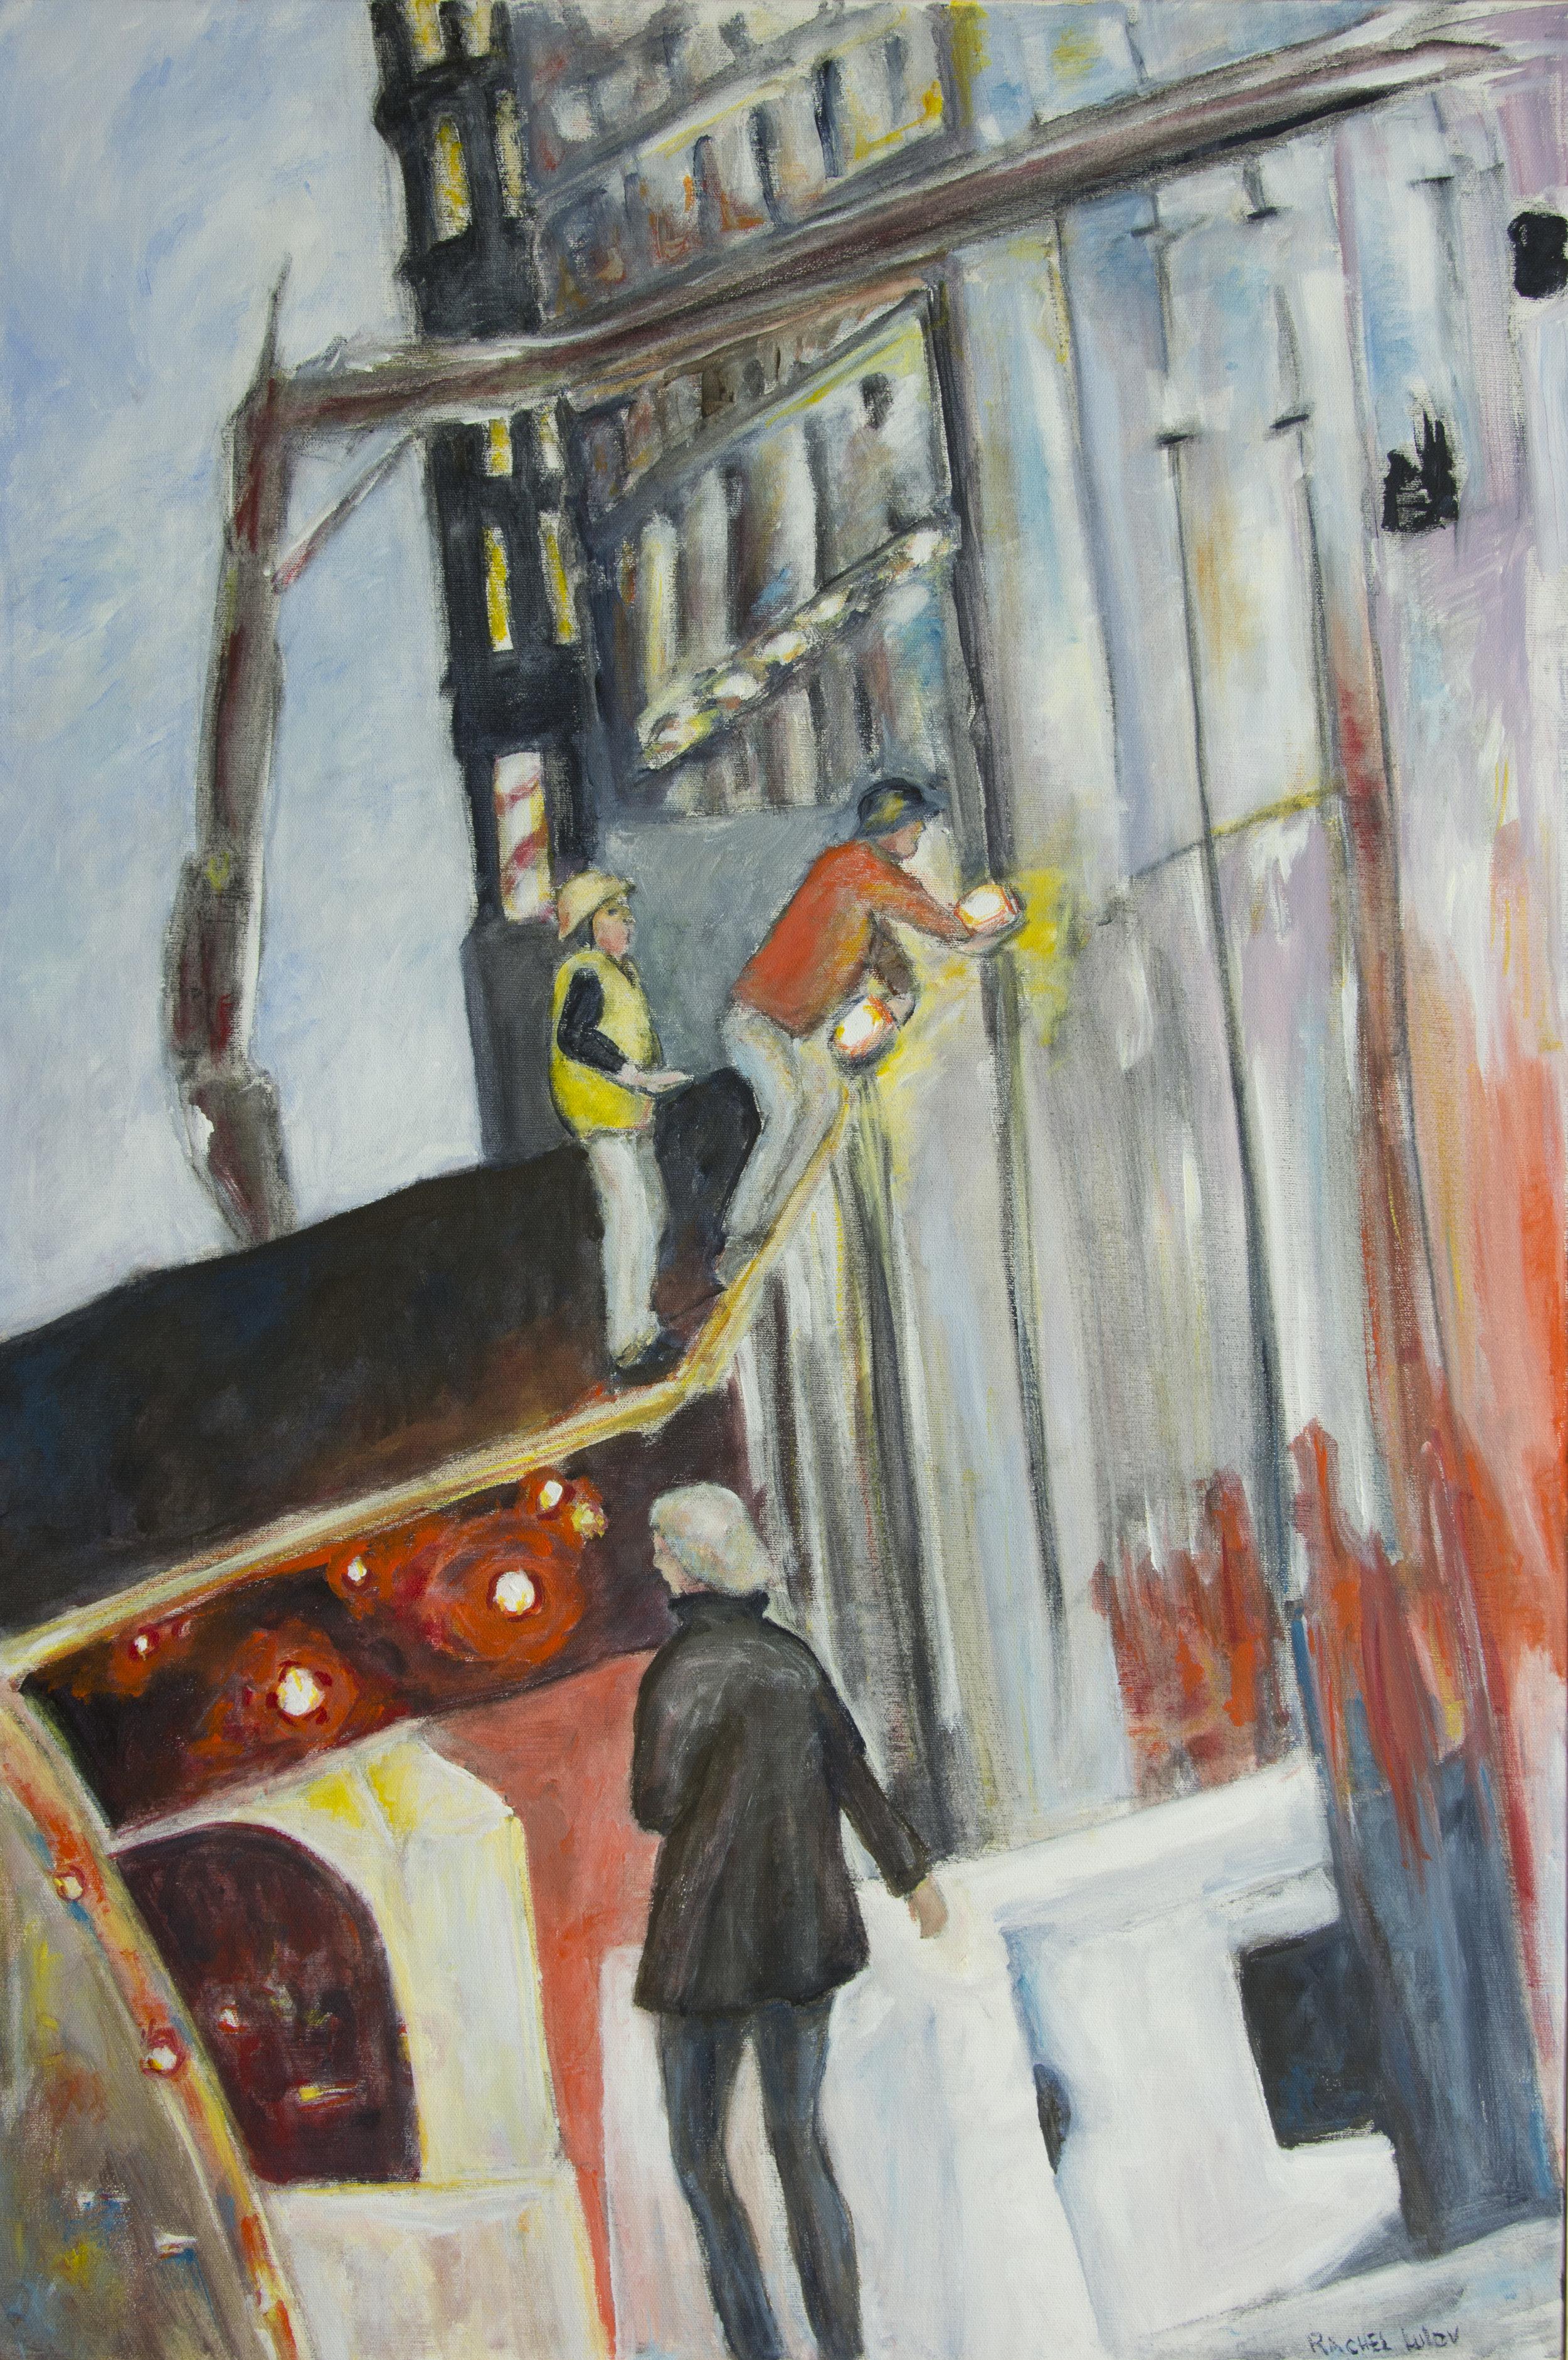 "Woman Passing Construction Site acrylic on canvas 24"" x 36"" Rachel Lulov Segall"